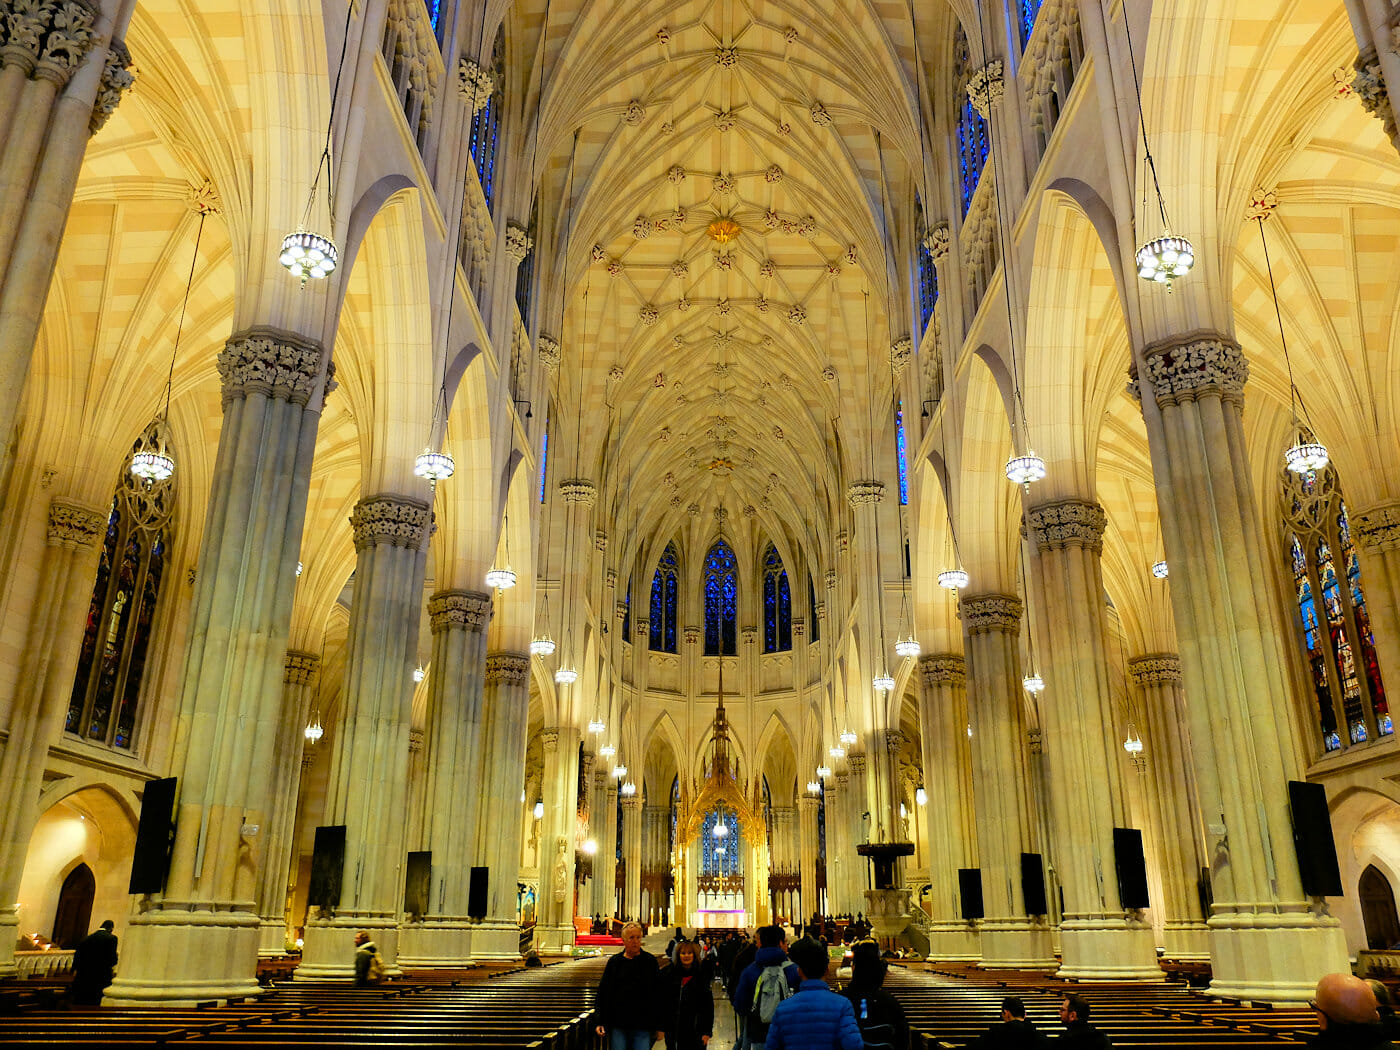 St Patricks Cathedral in New York Impressive Architecture